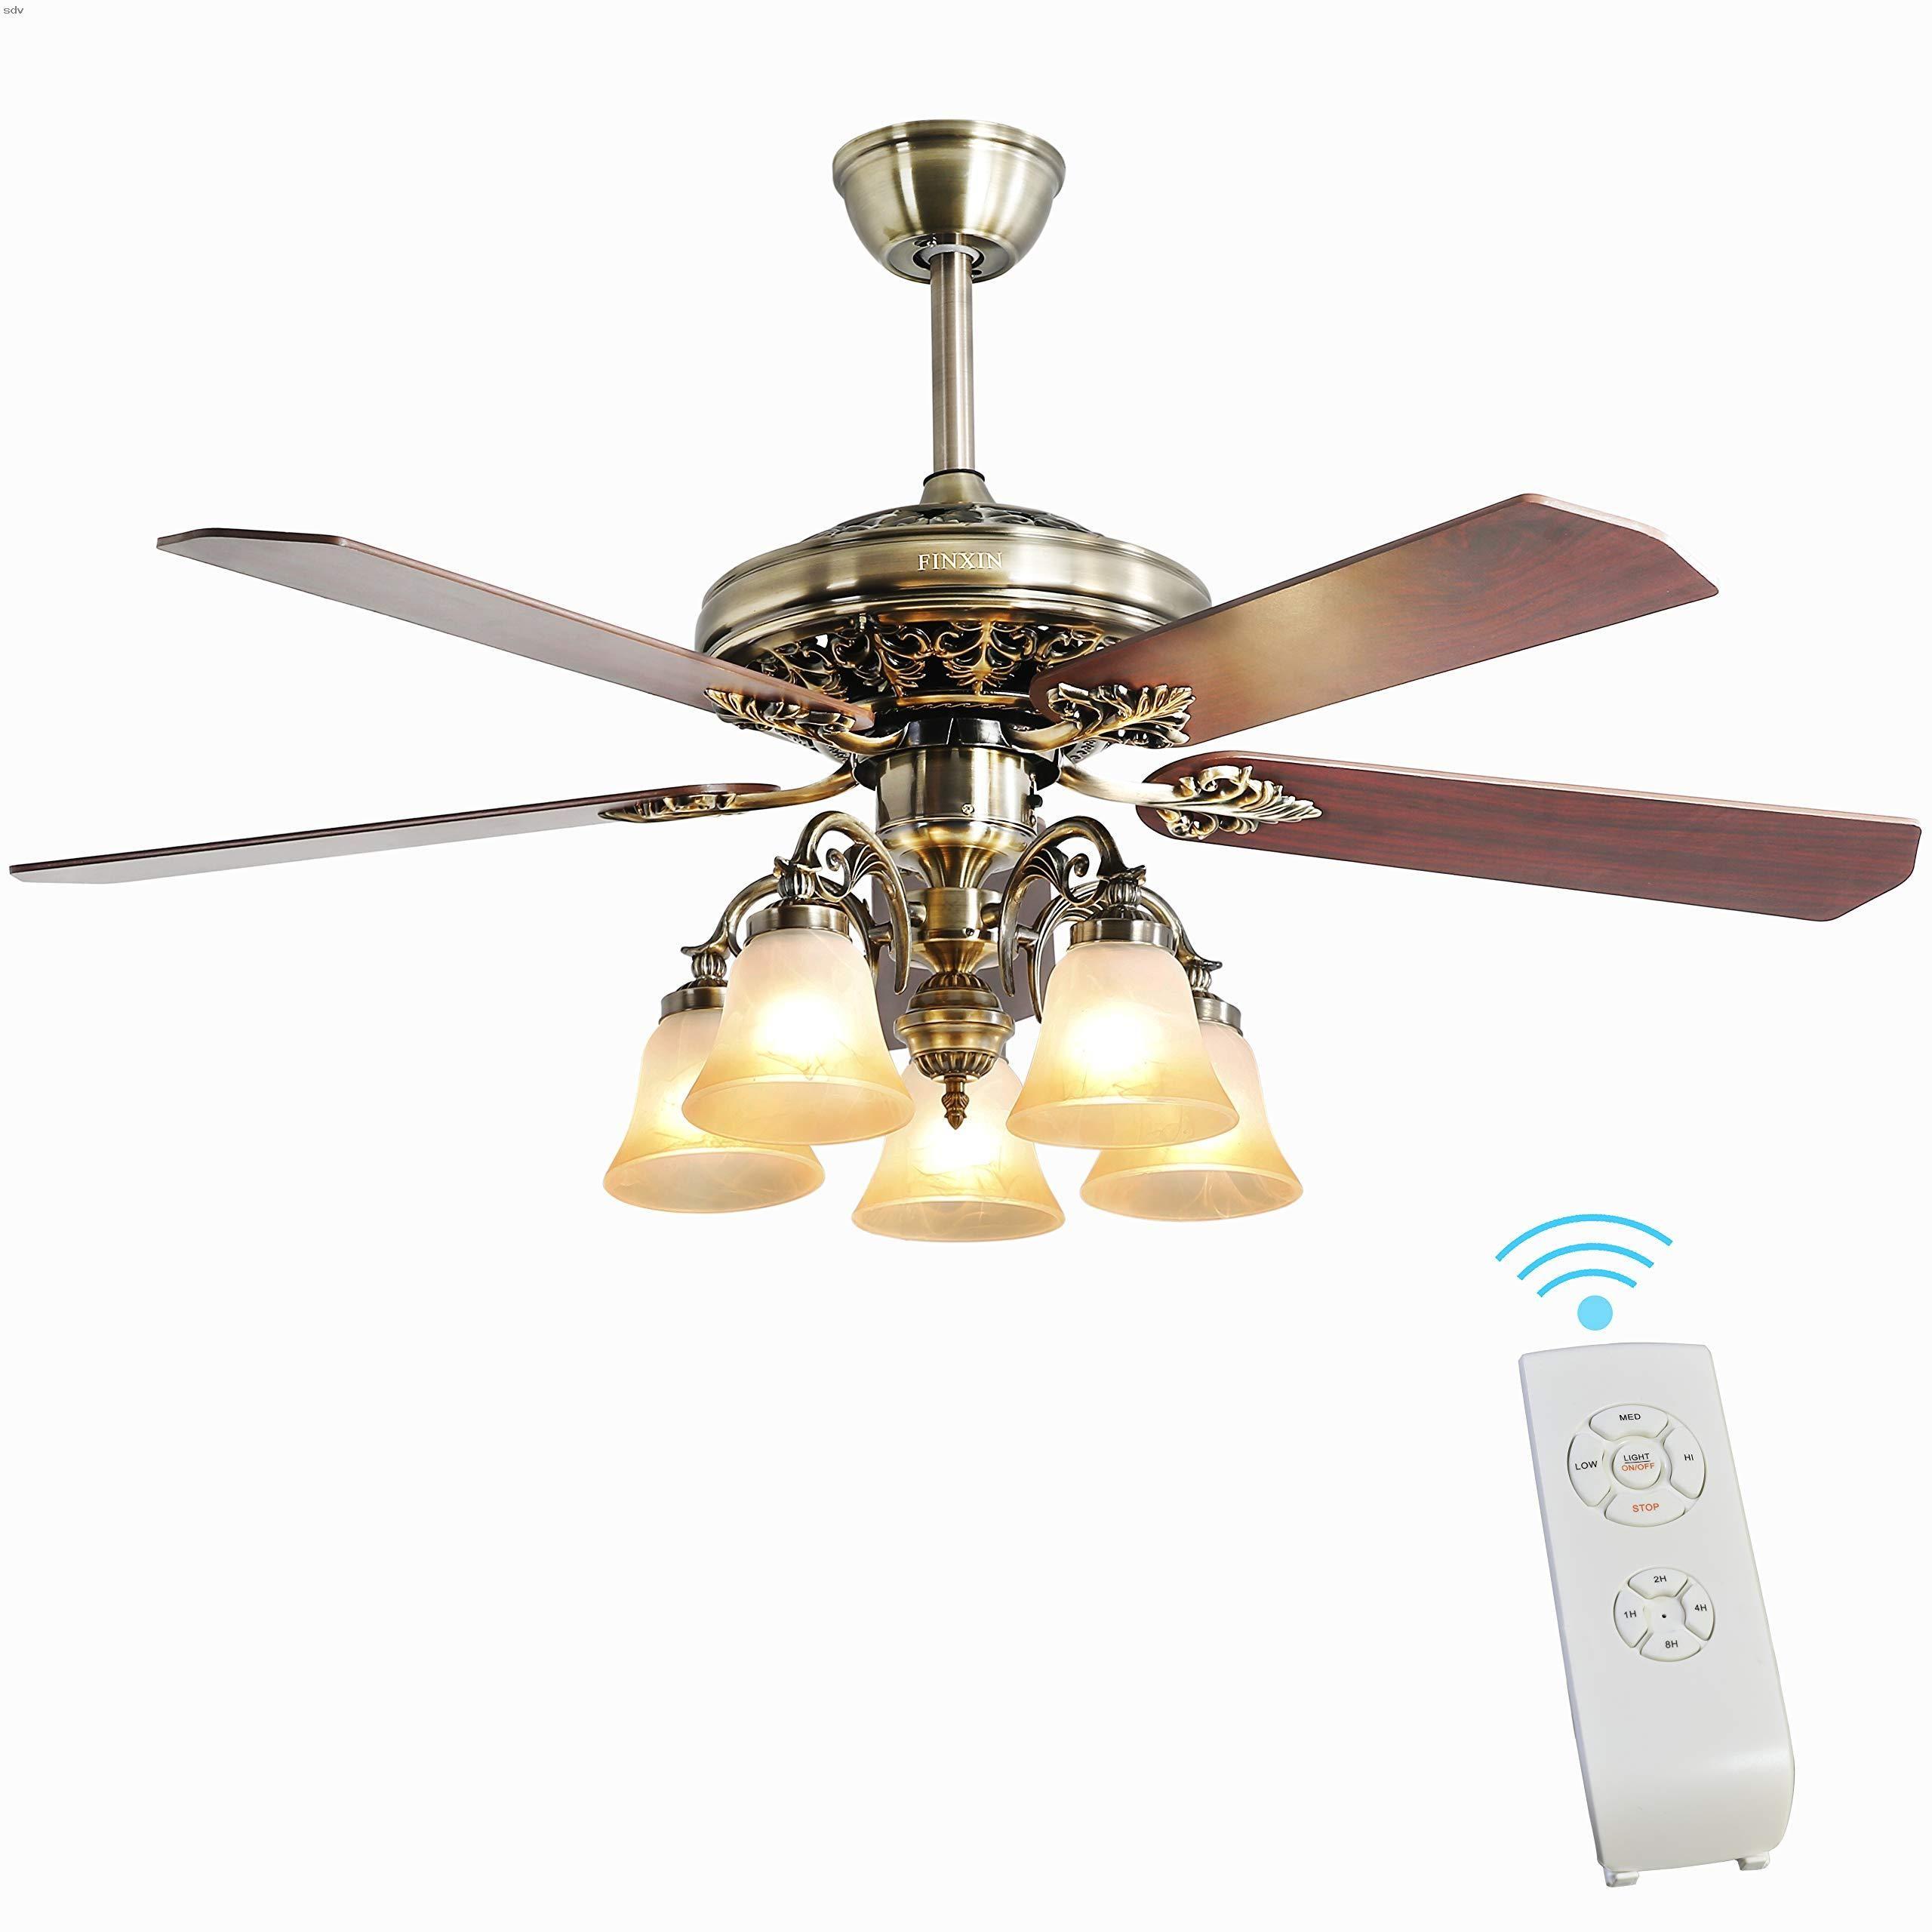 Indoor Ceiling Fan Light Fixtures Finxin New Bronze Remote Led 52 Ceiling Fans For Bedroom Living Room Dining Room Including Motor 5 Light 5 Blades Remote Swi